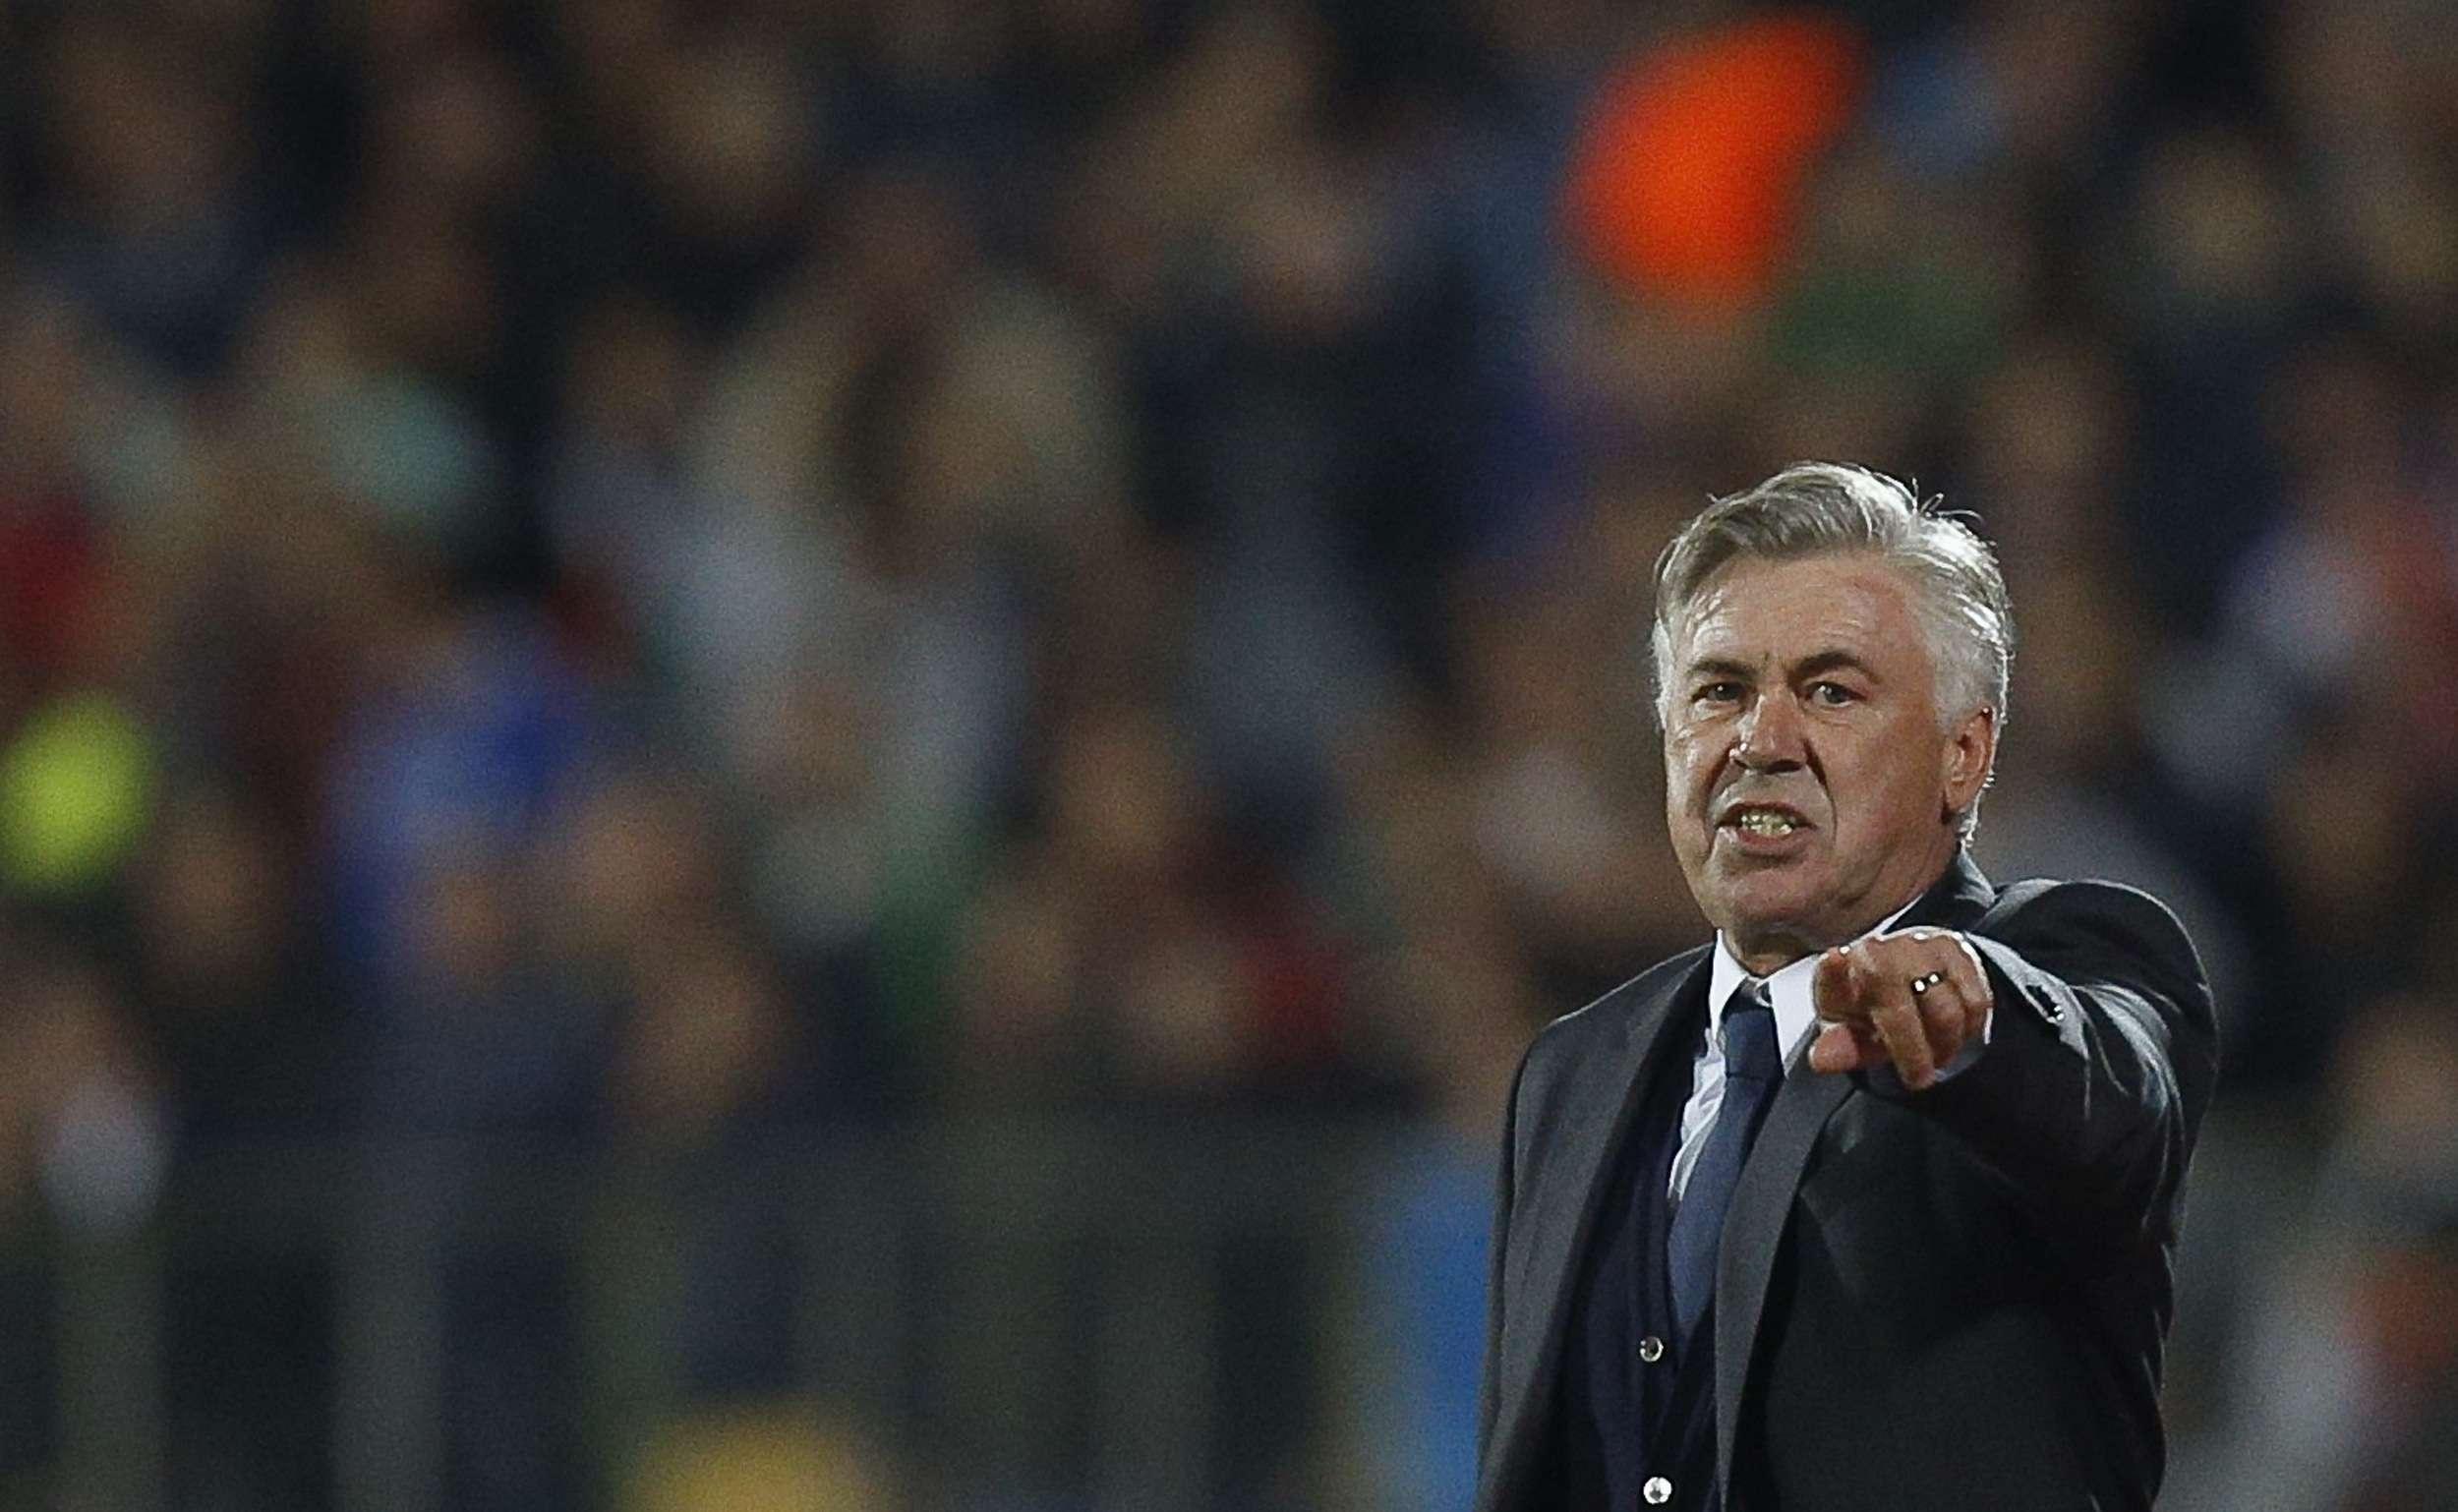 Carlo Ancelotti. Foto: Reuters en español